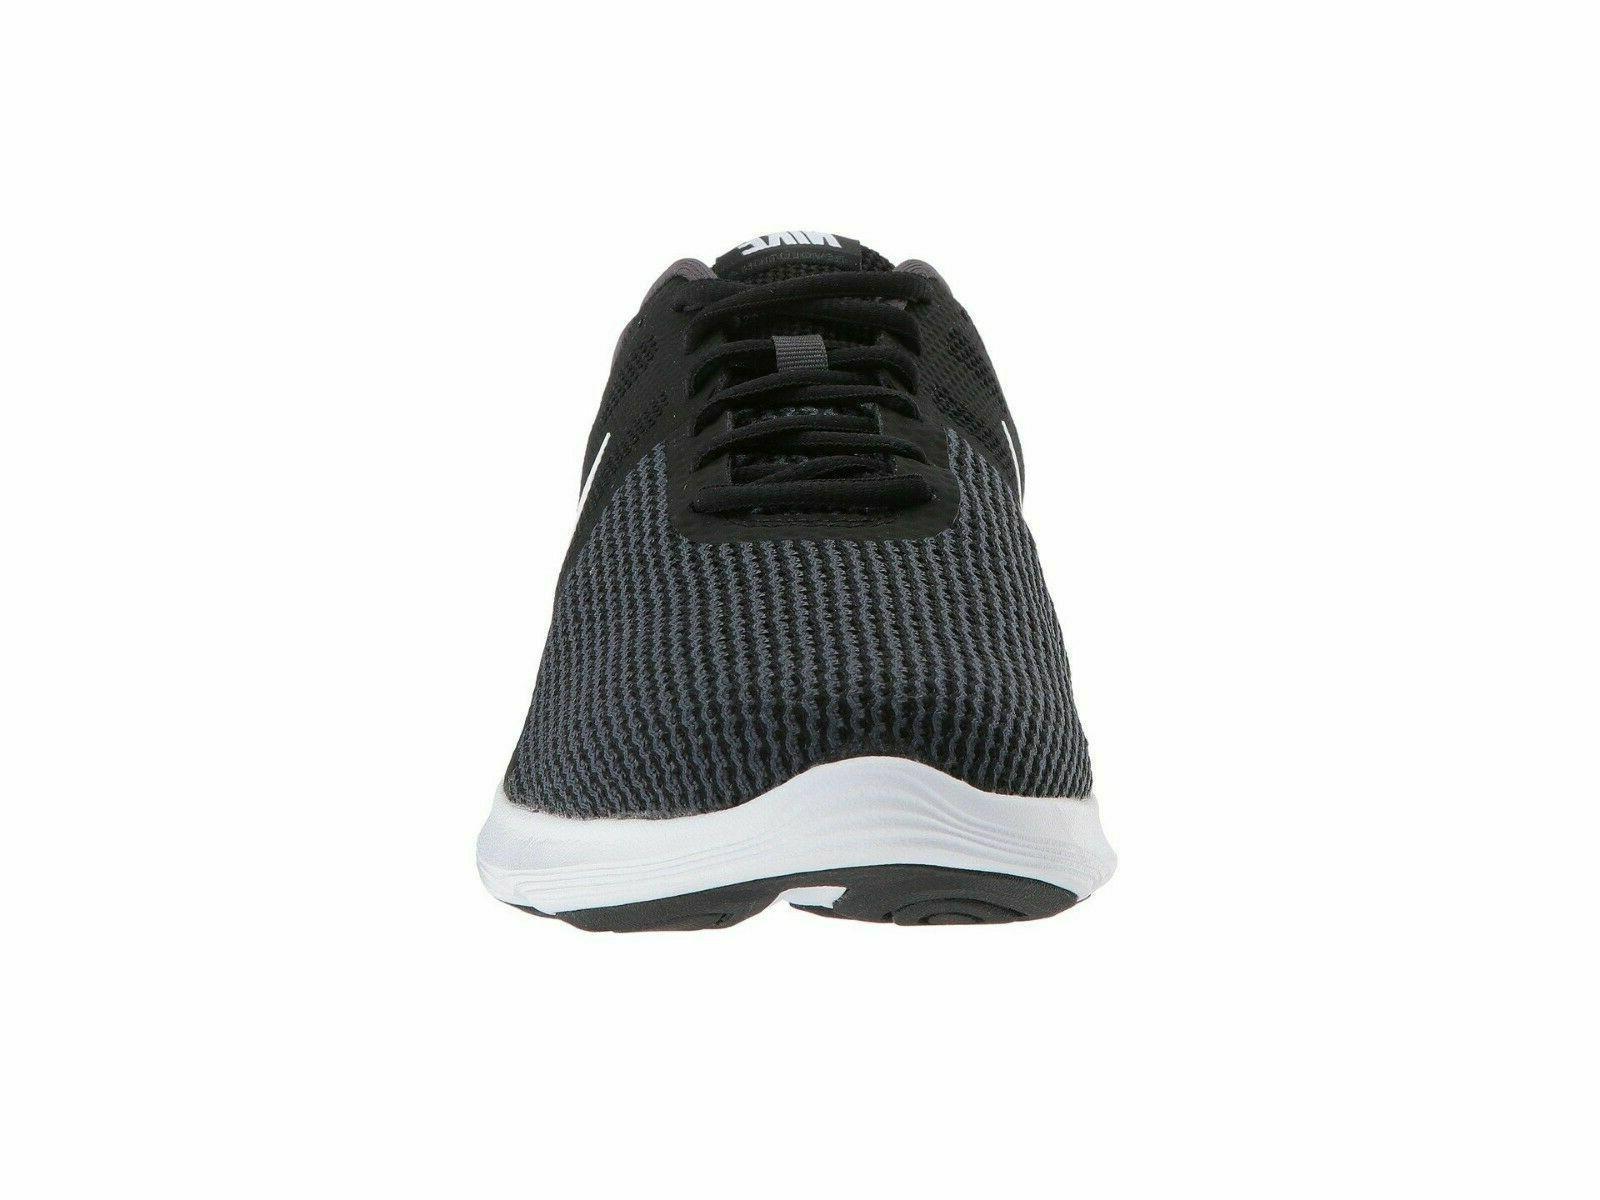 Shoes Black White 908988-001